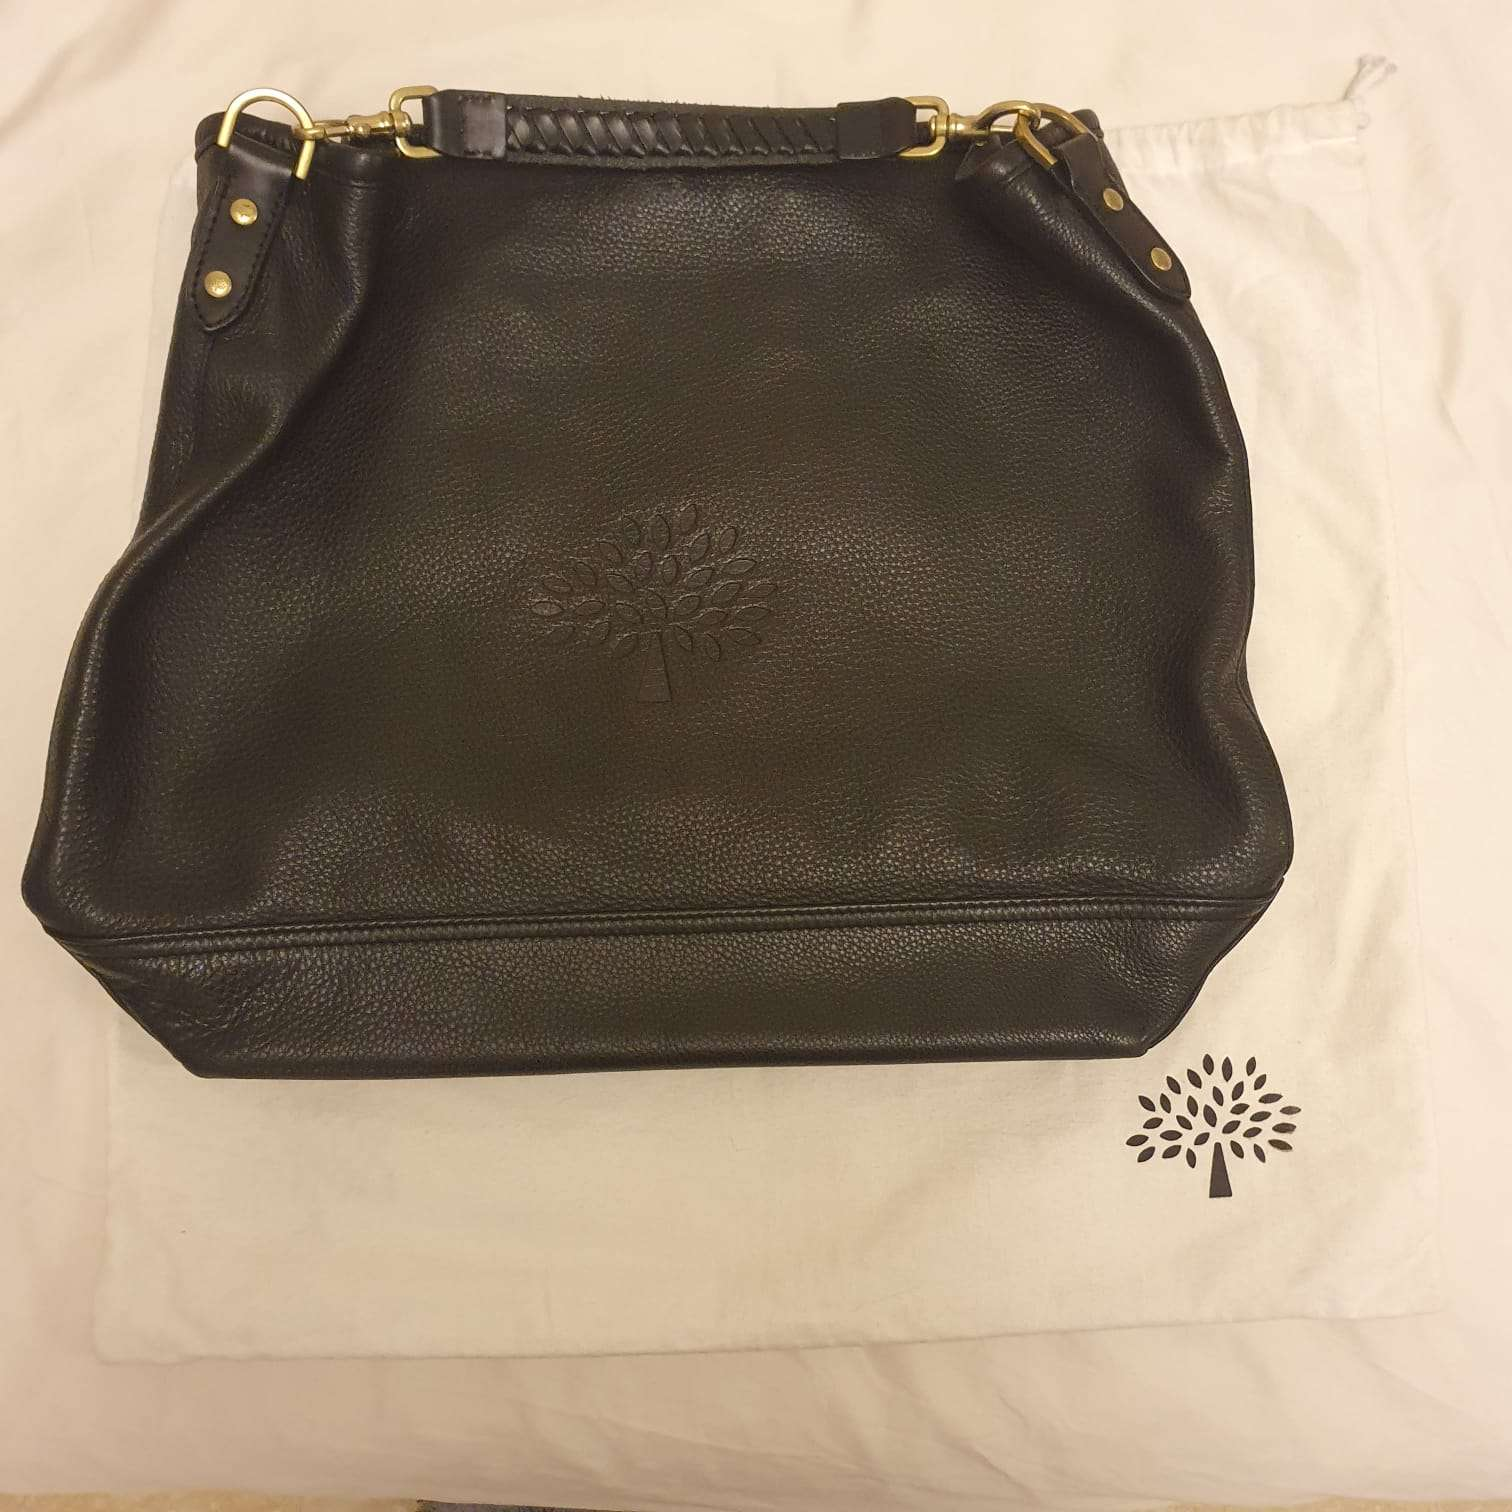 Black Mulberry handbag